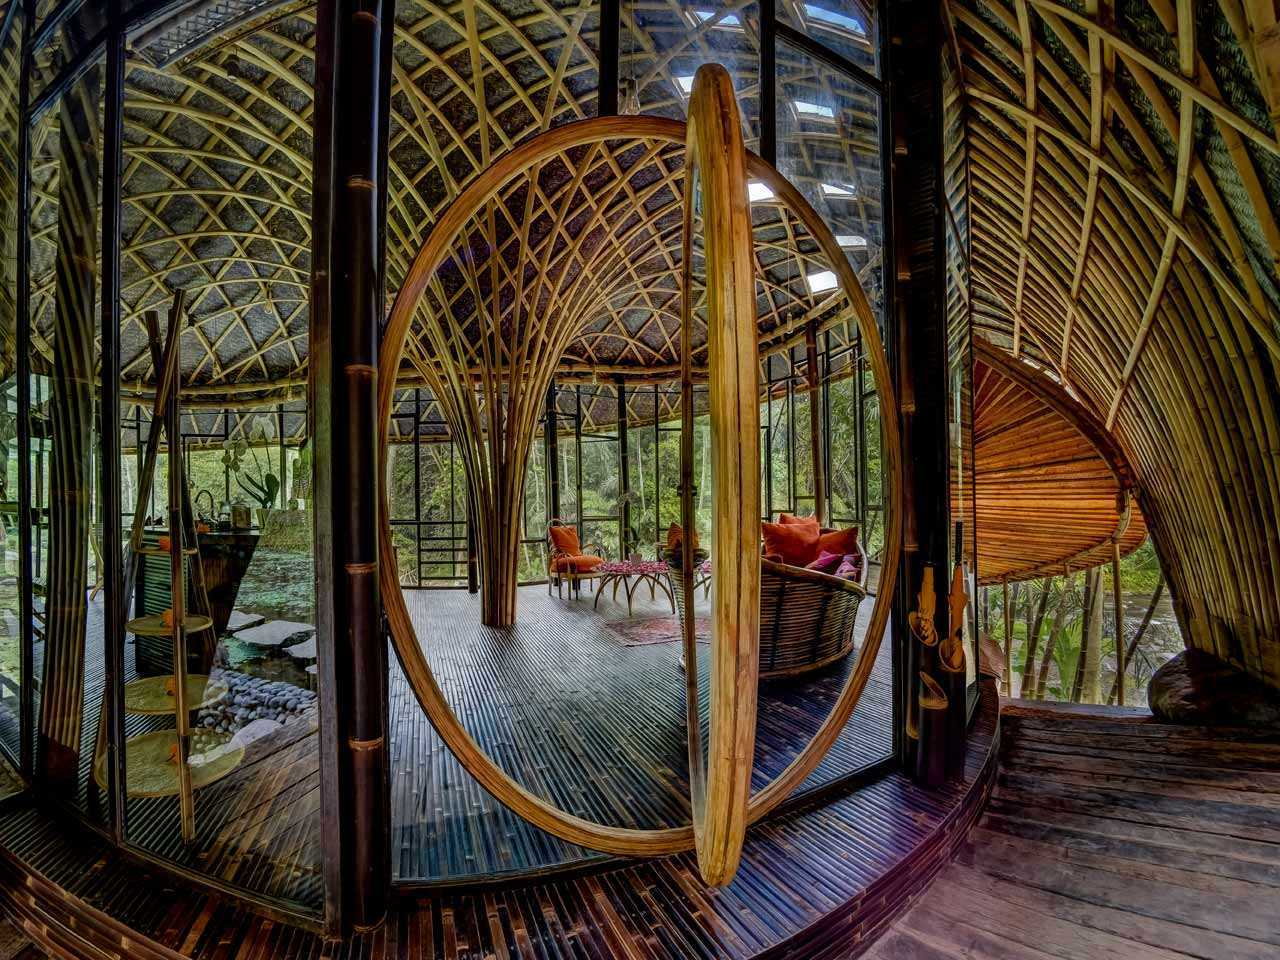 Agung Budi Raharsa | Architecture & Engineering Riverbend Bamboo House - Bali Bali, Indonesia Bali, Indonesia Interior View Tropical 88707